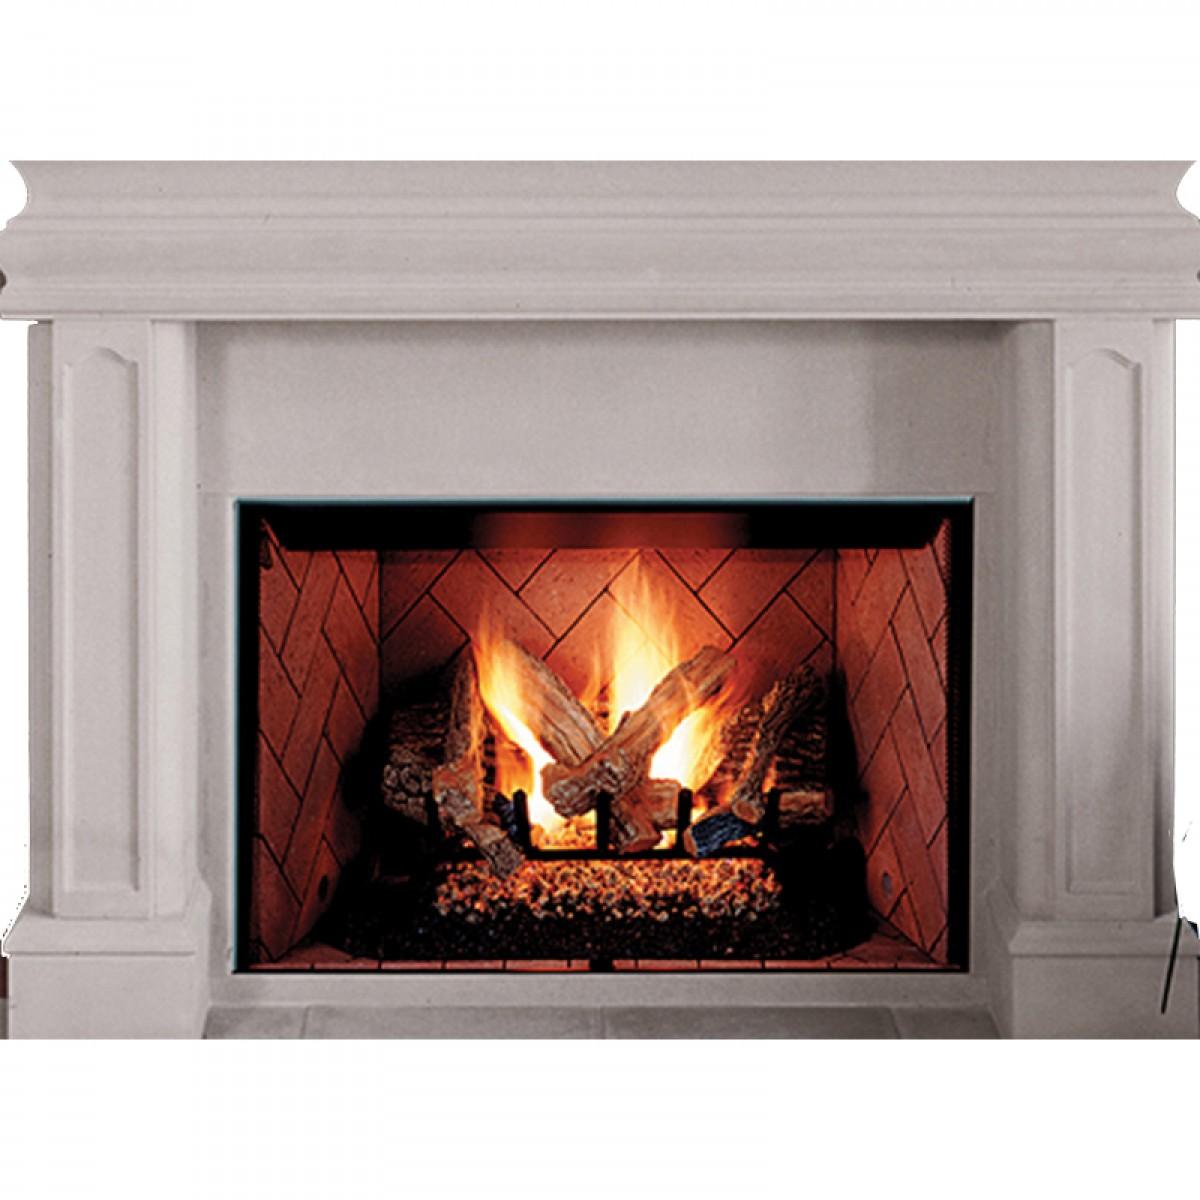 view superior size com full fireplace of background x photo finallyfastblog